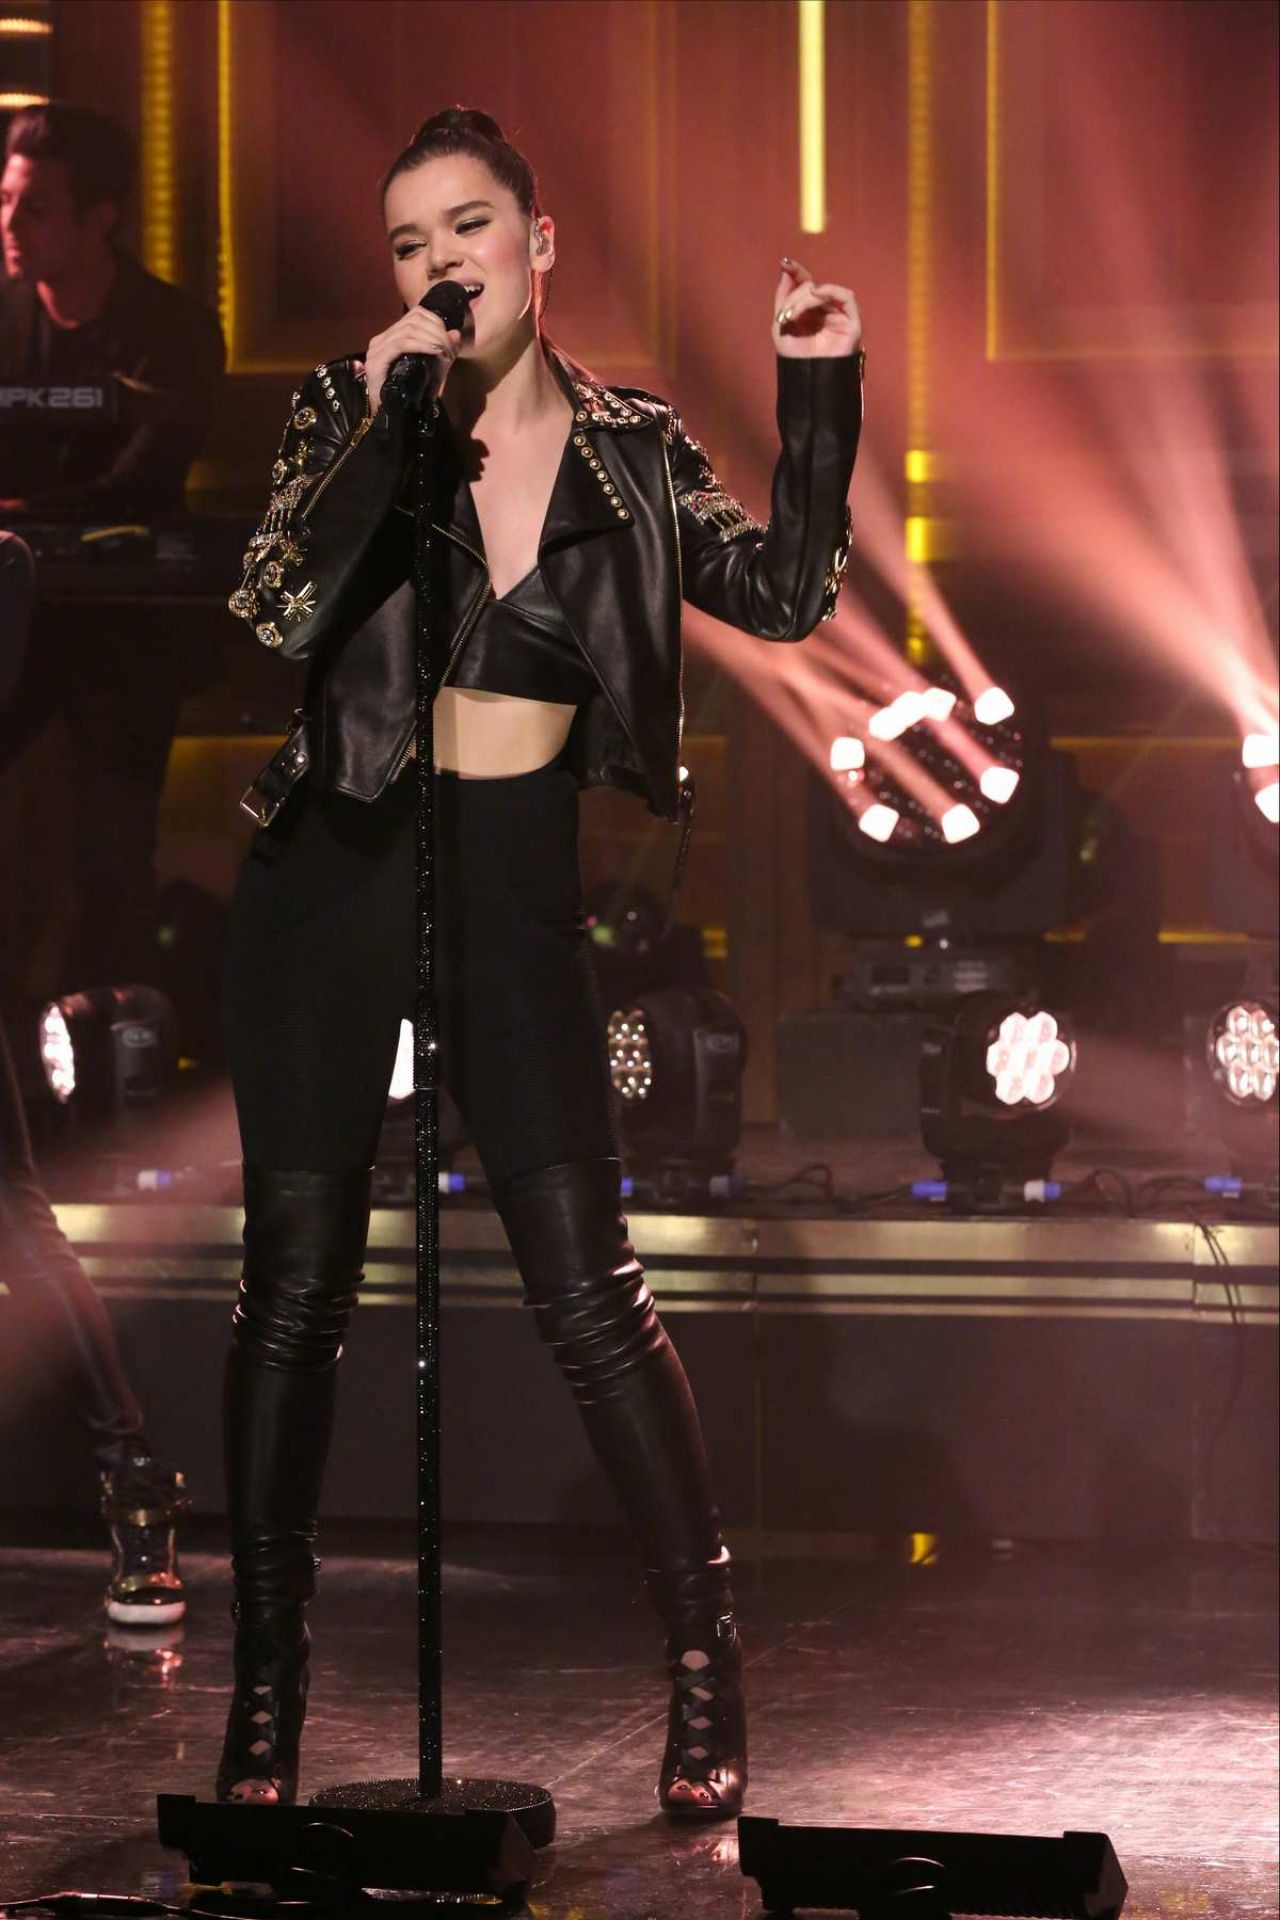 Miley cyrus toronto concert - 2 7